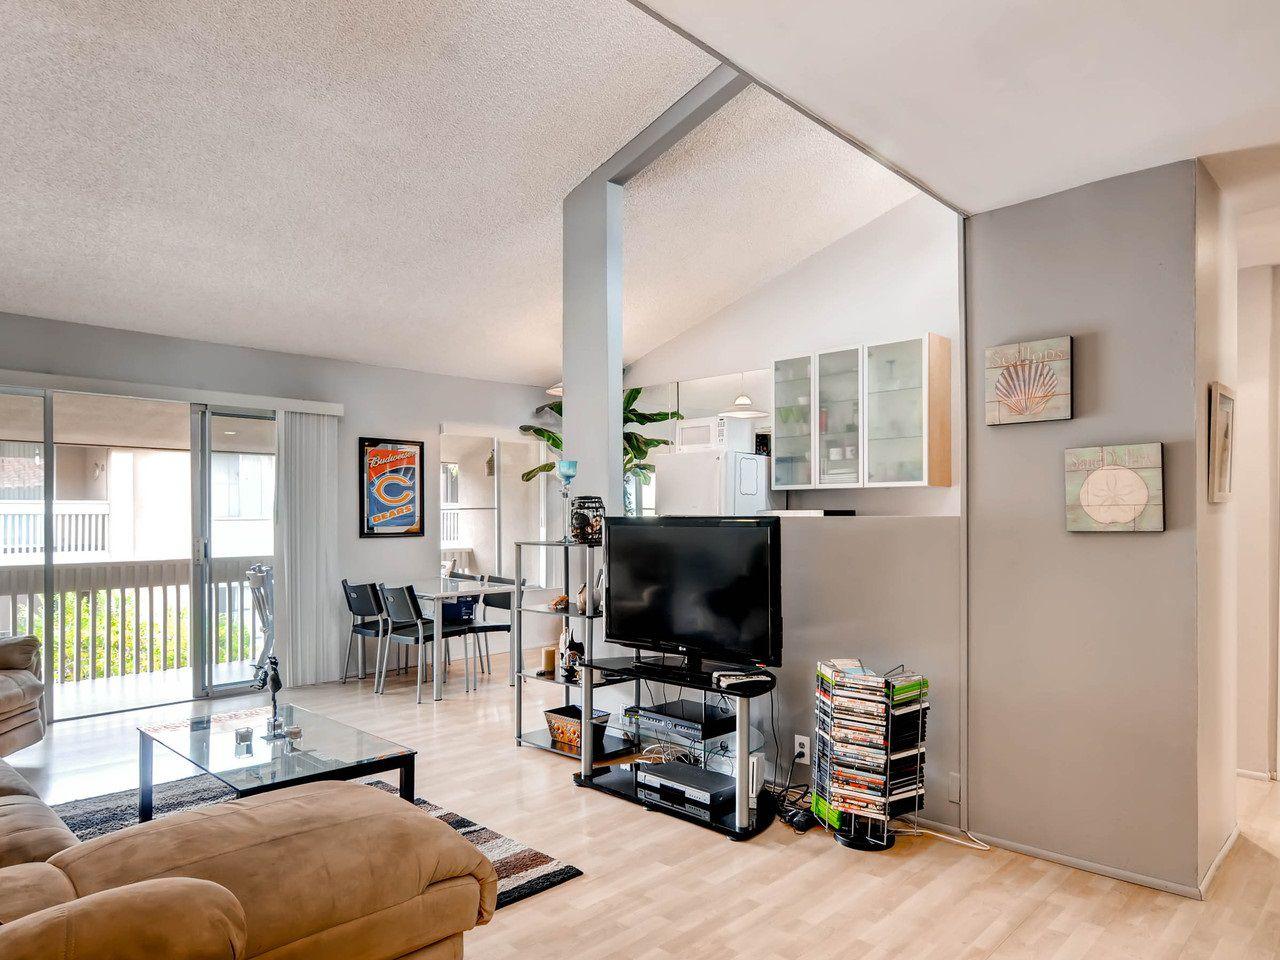 Main Photo: PACIFIC BEACH Condo for sale : 2 bedrooms : 1801 Diamond St. #318 in San Diego